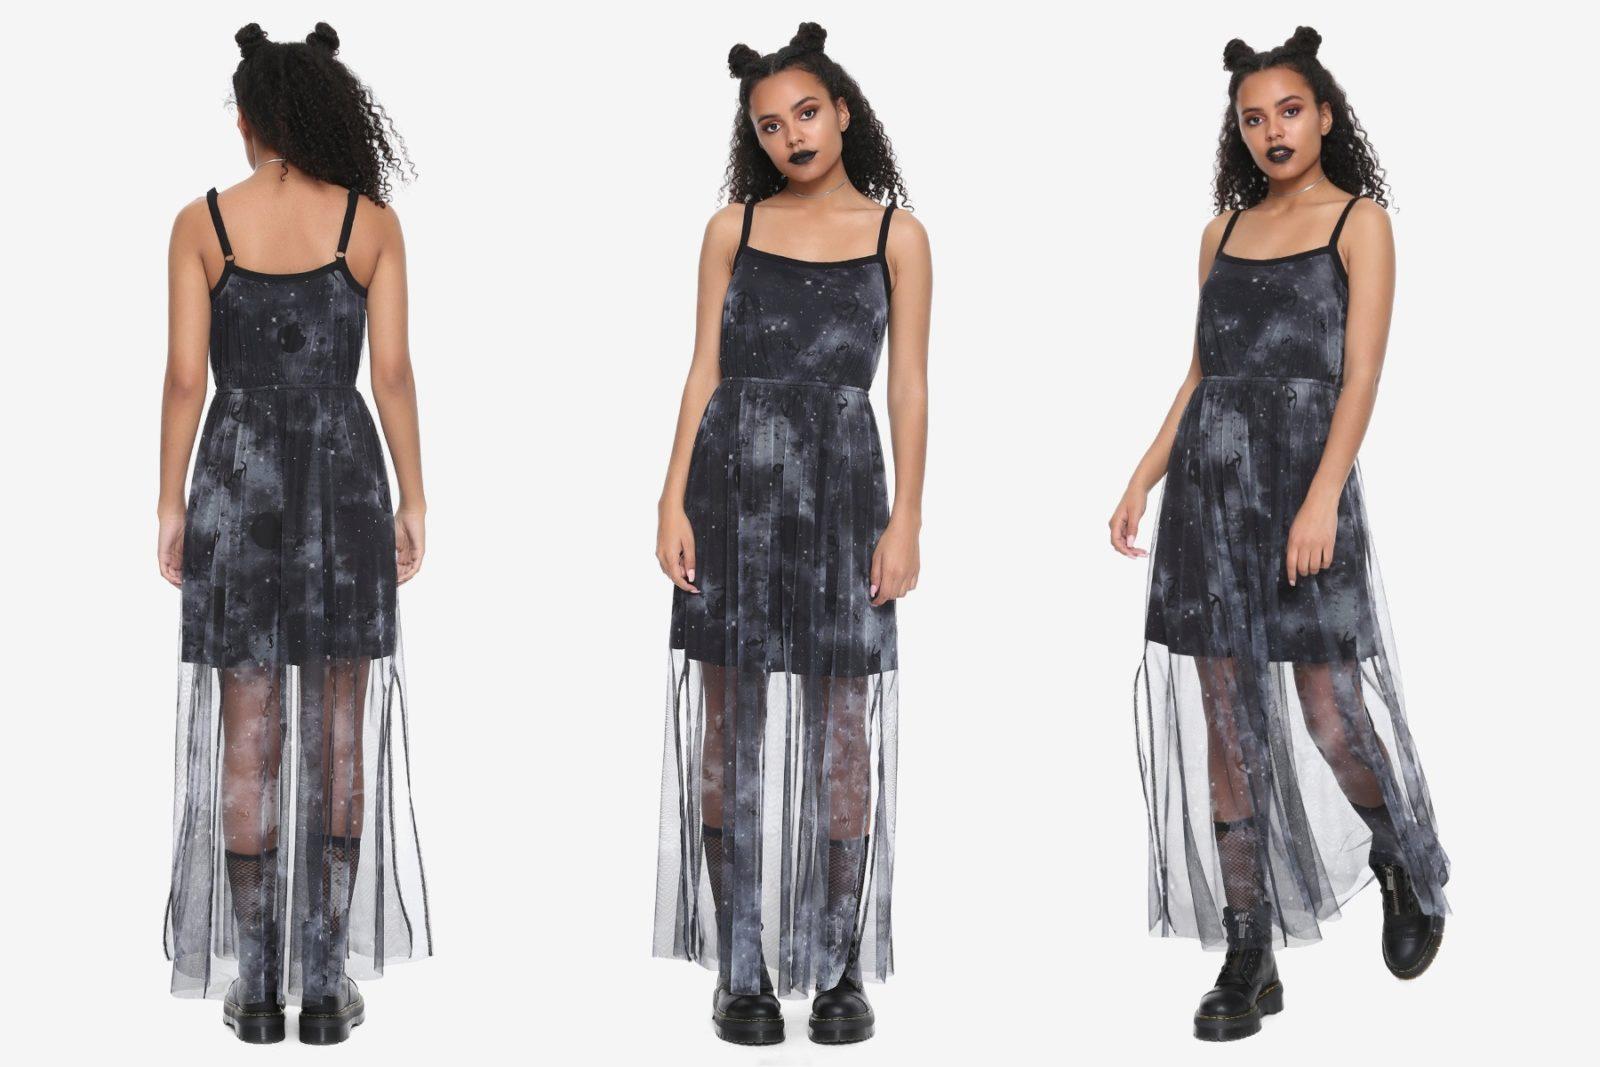 Star Wars Starfighter Maxi Dress at Hot Topic